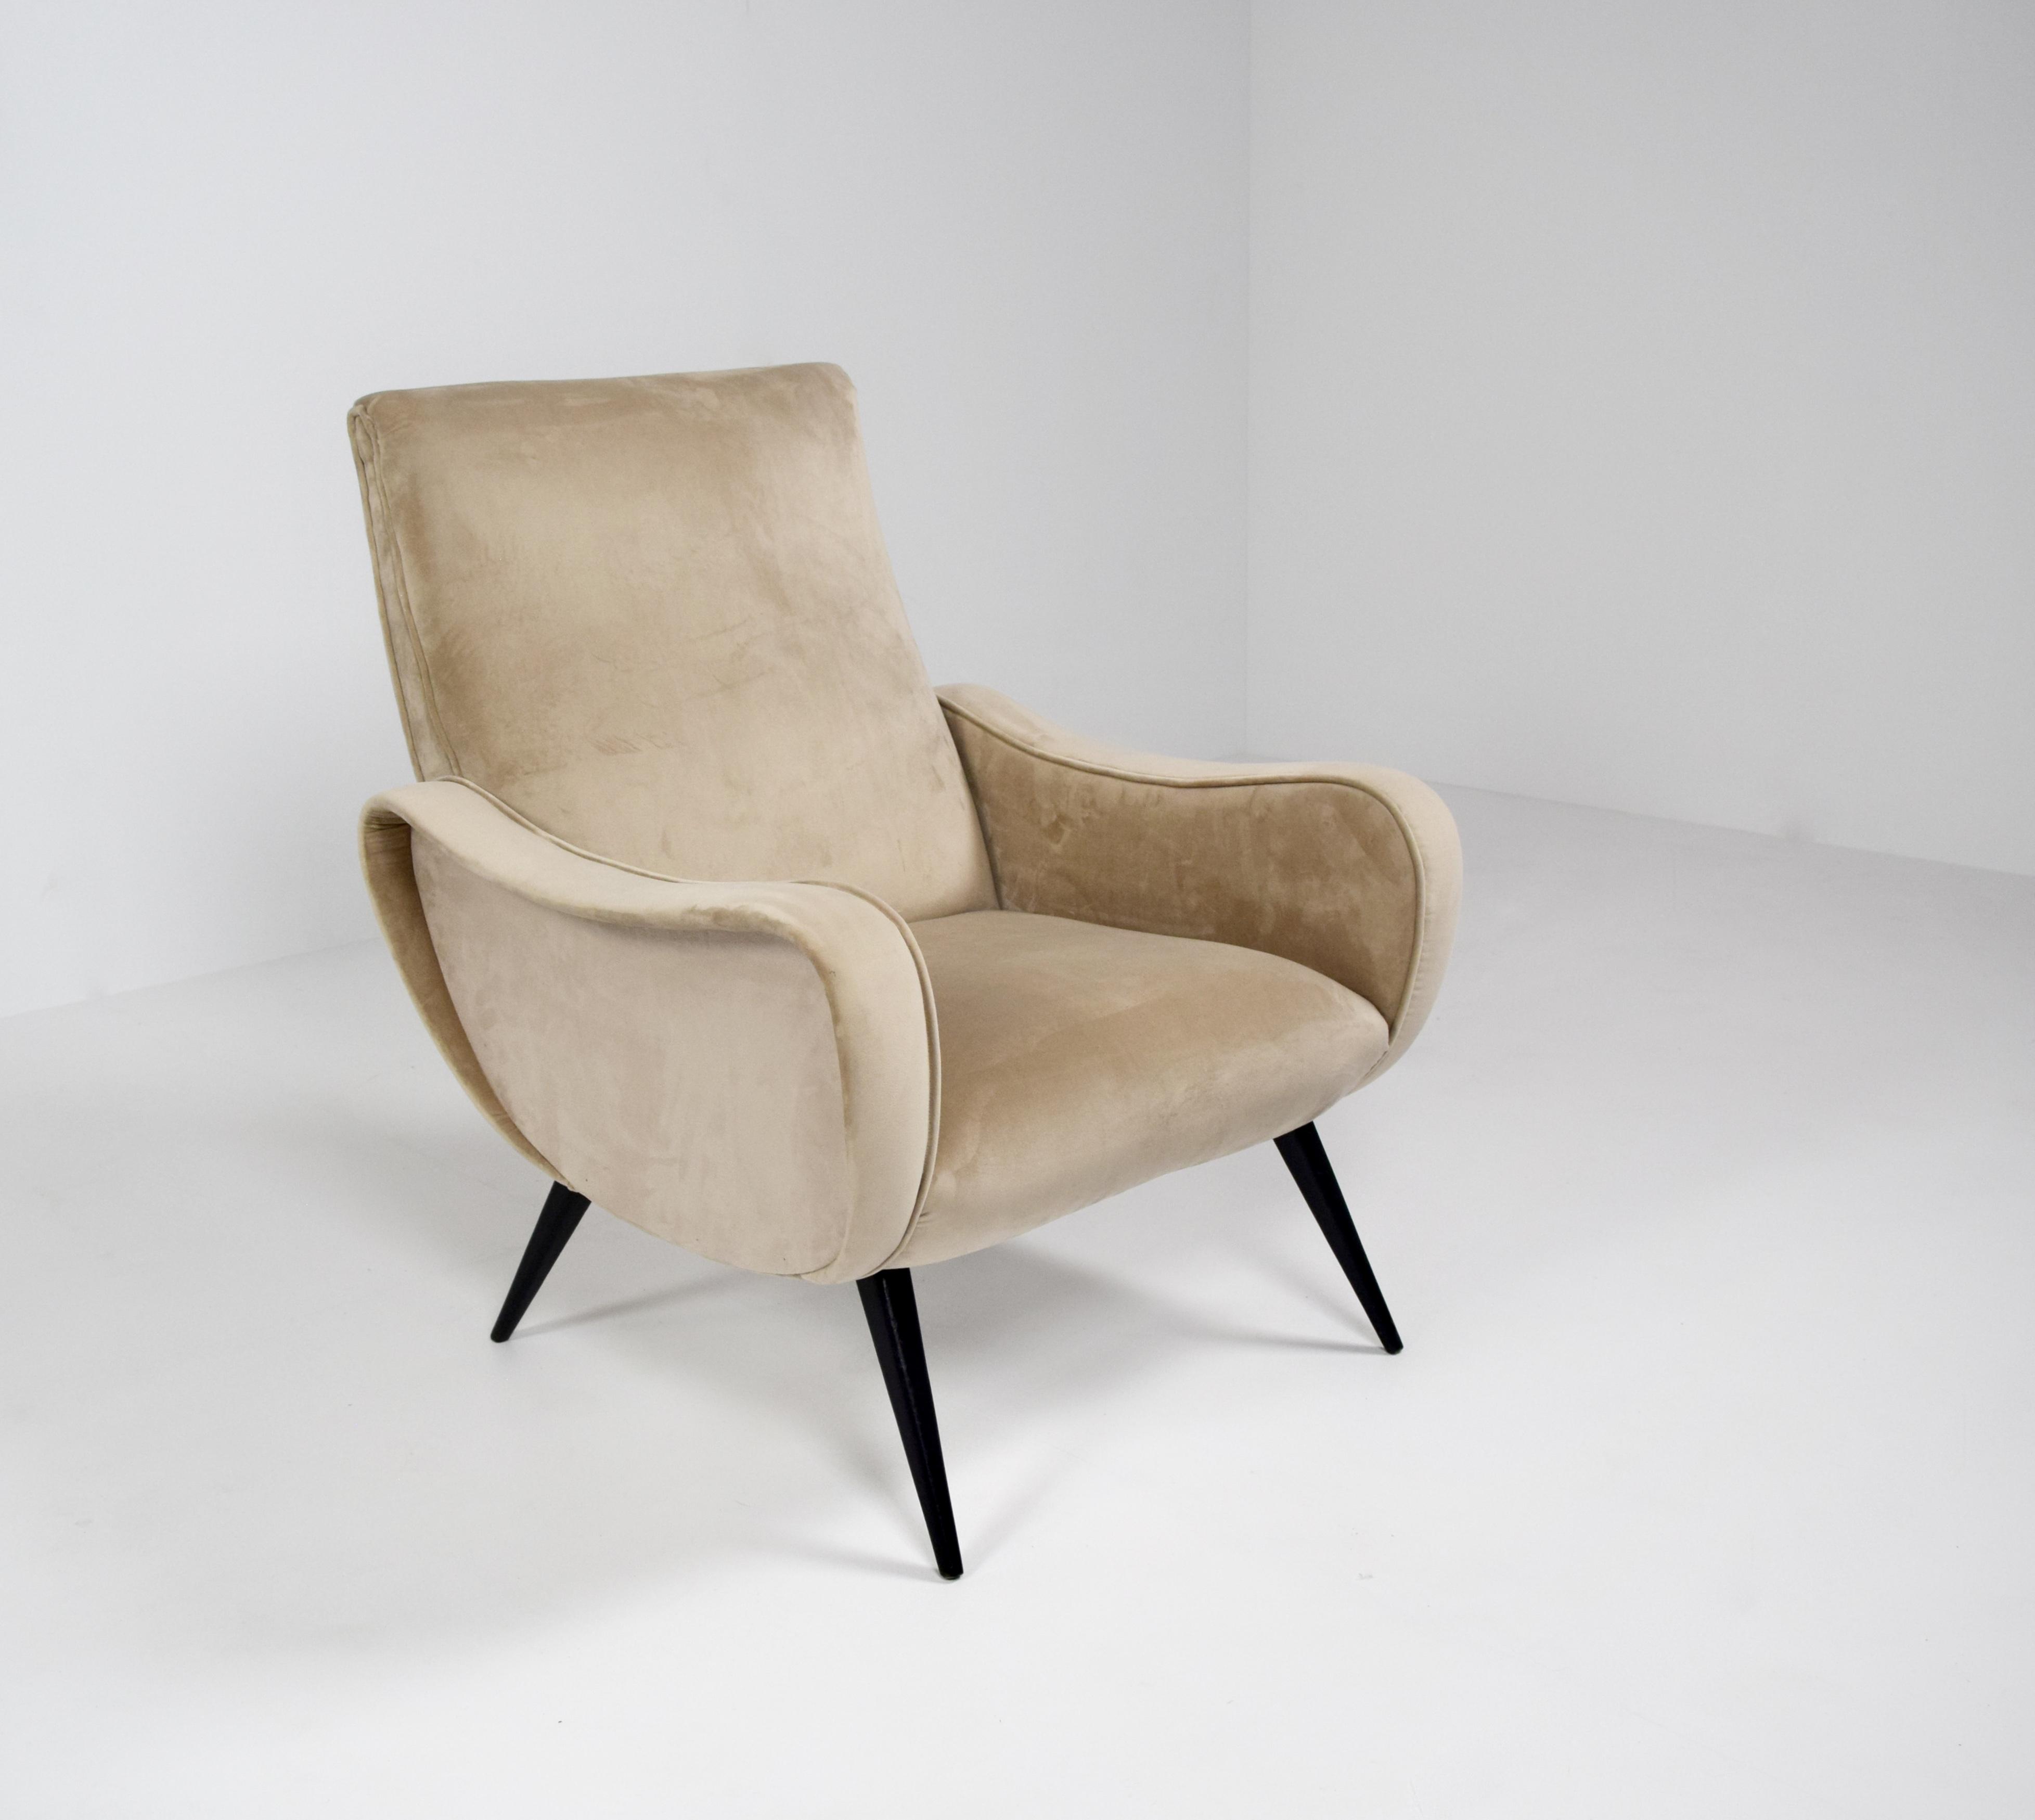 Poltrona Lady Arm Chair by Marco Zanuso, Italy 1960